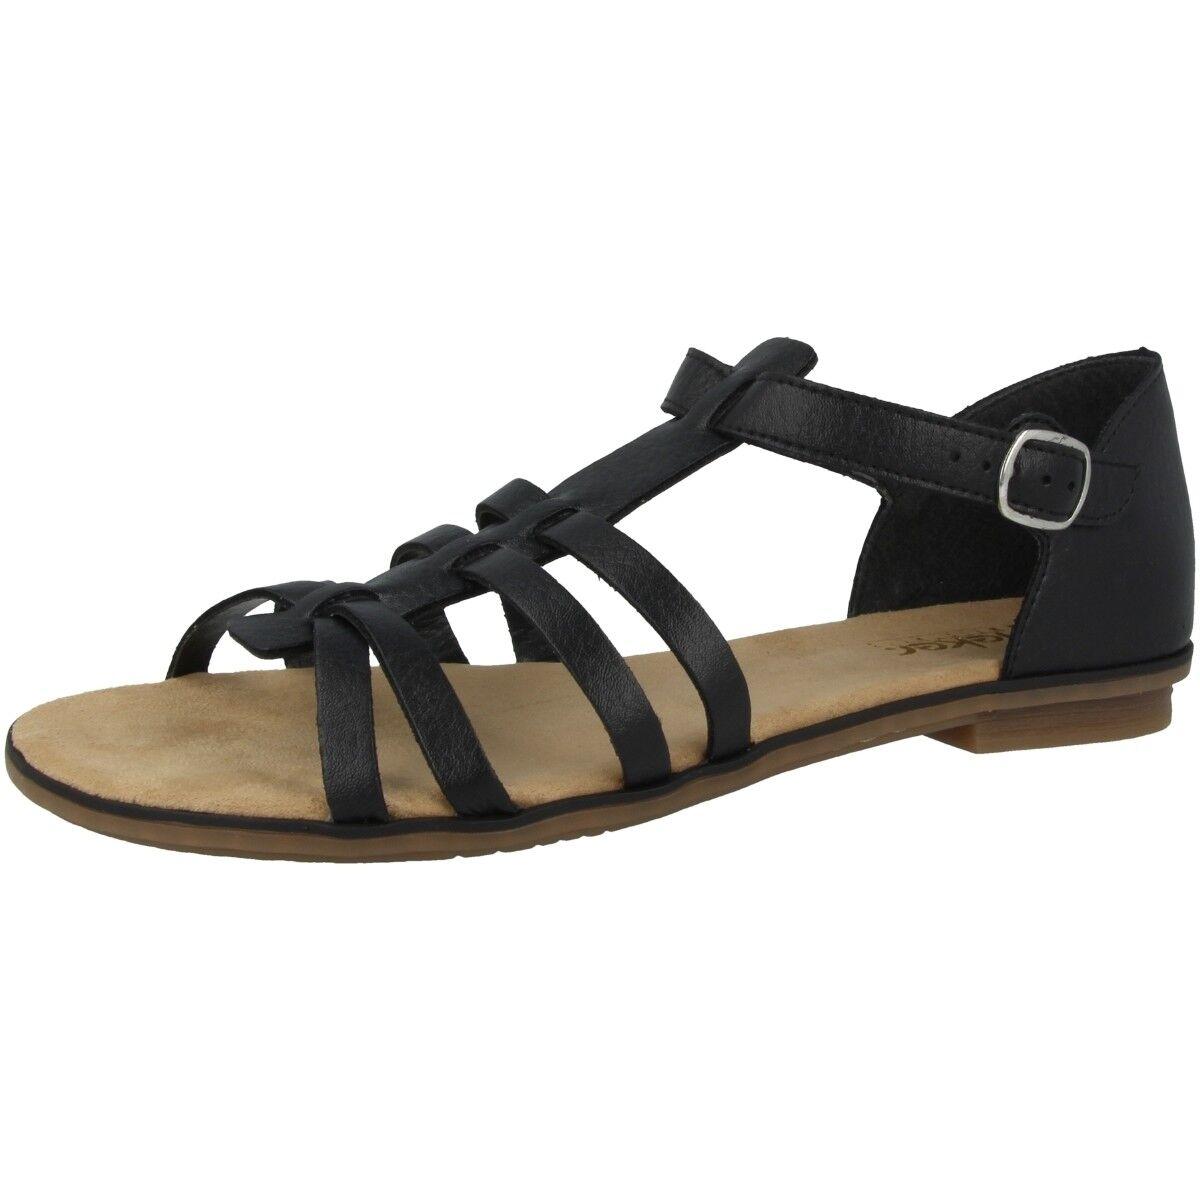 Rieker 'kalkutta women women casual sandals shoes black sandals 64288-01